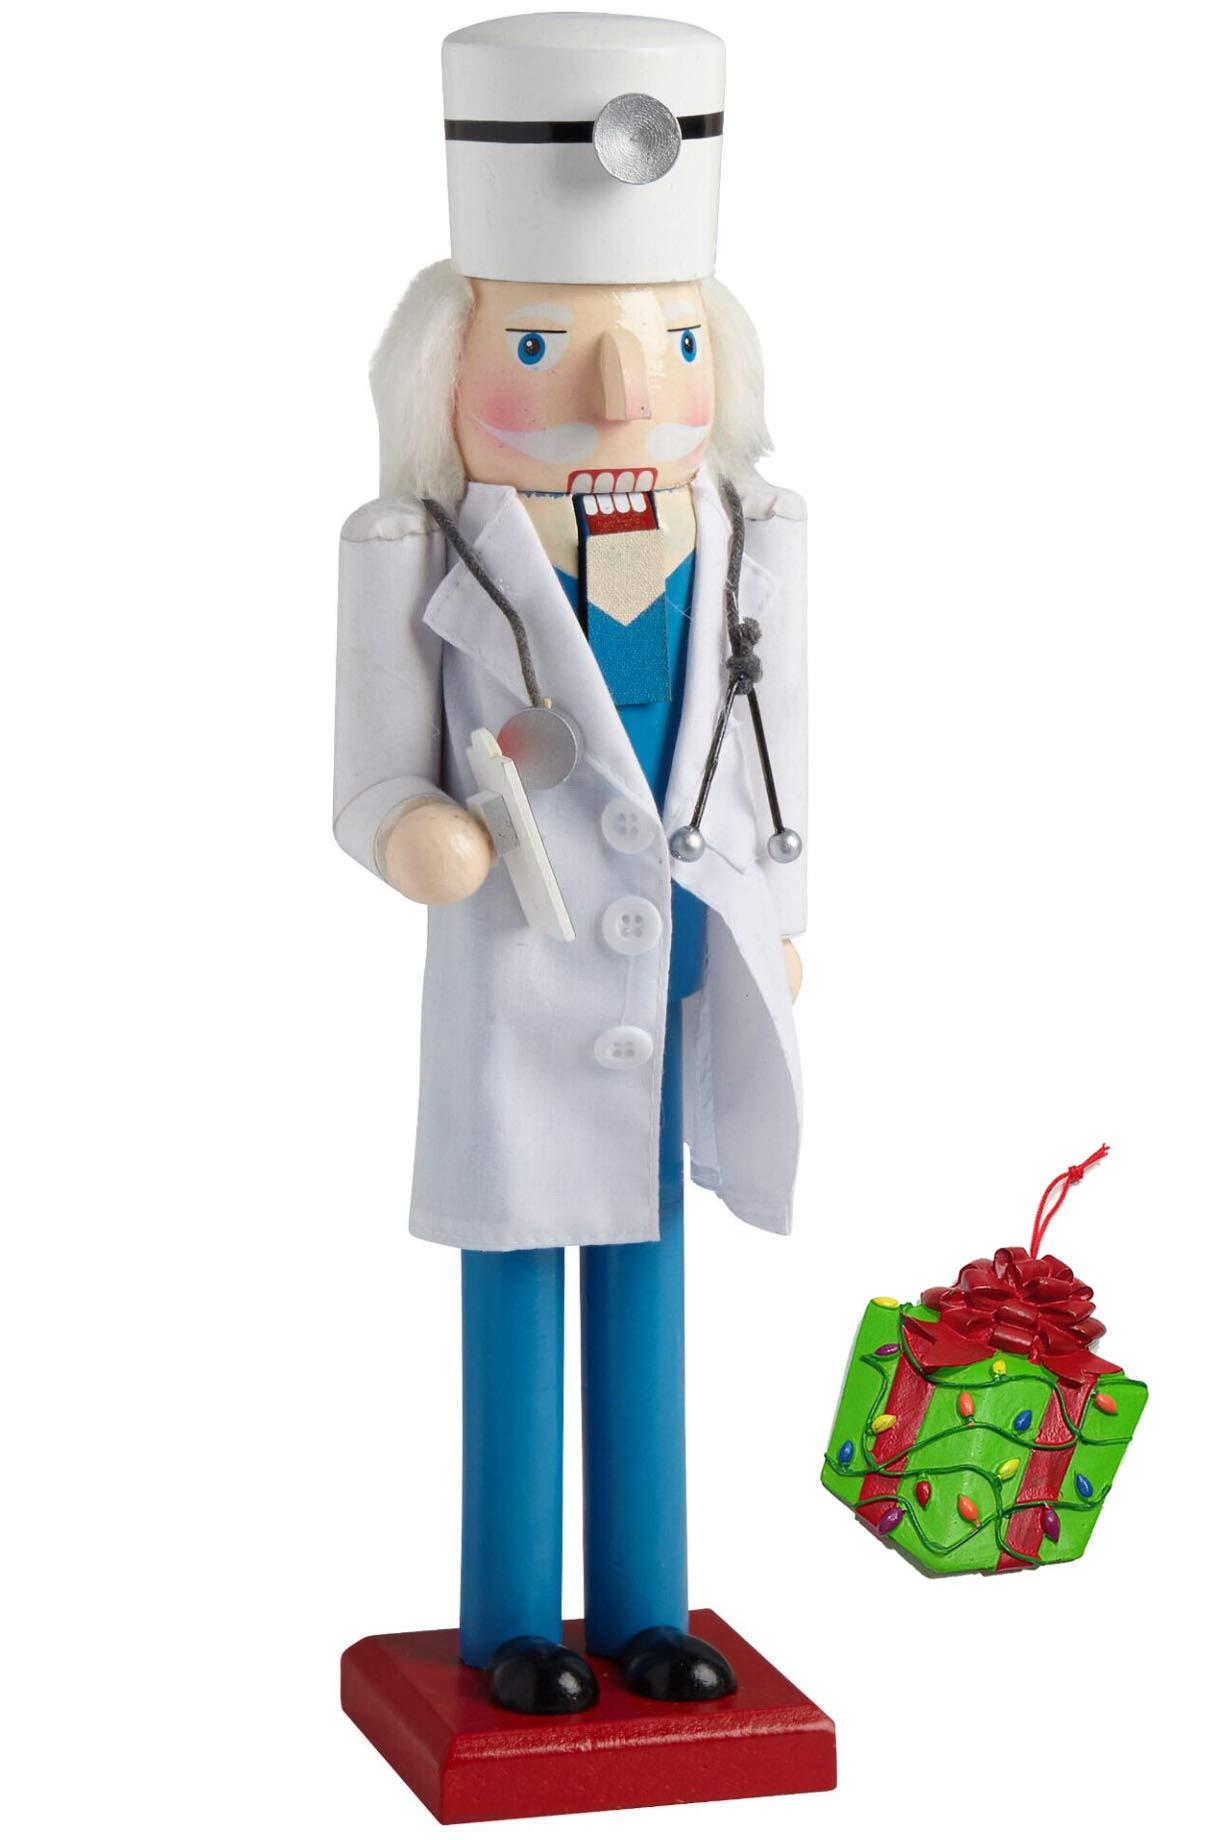 Distinctive Designs Medical Doctor Large Decorative Holiday Season Wooden Christmas Nutcracker & Bonus Tree Ornament